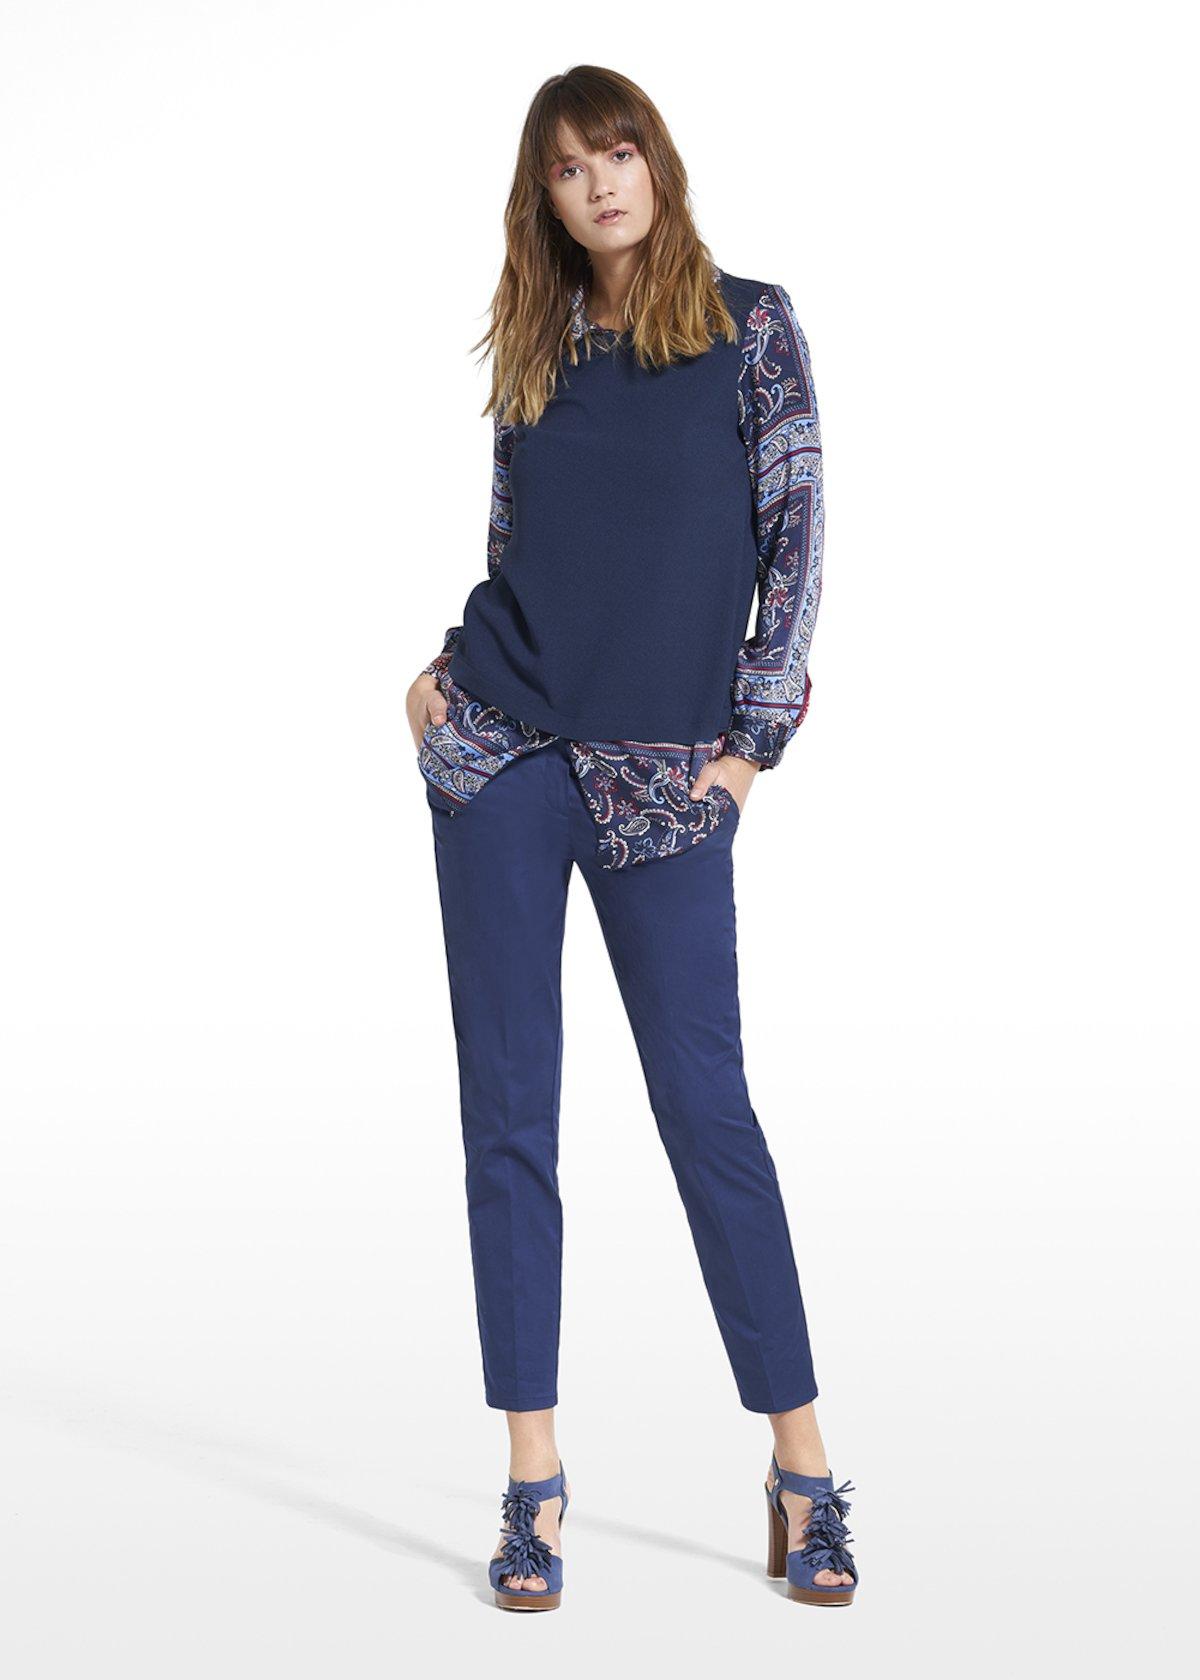 Sefora jersey with wave and levina fabric - Blue / Tulipano Fantasia - Woman